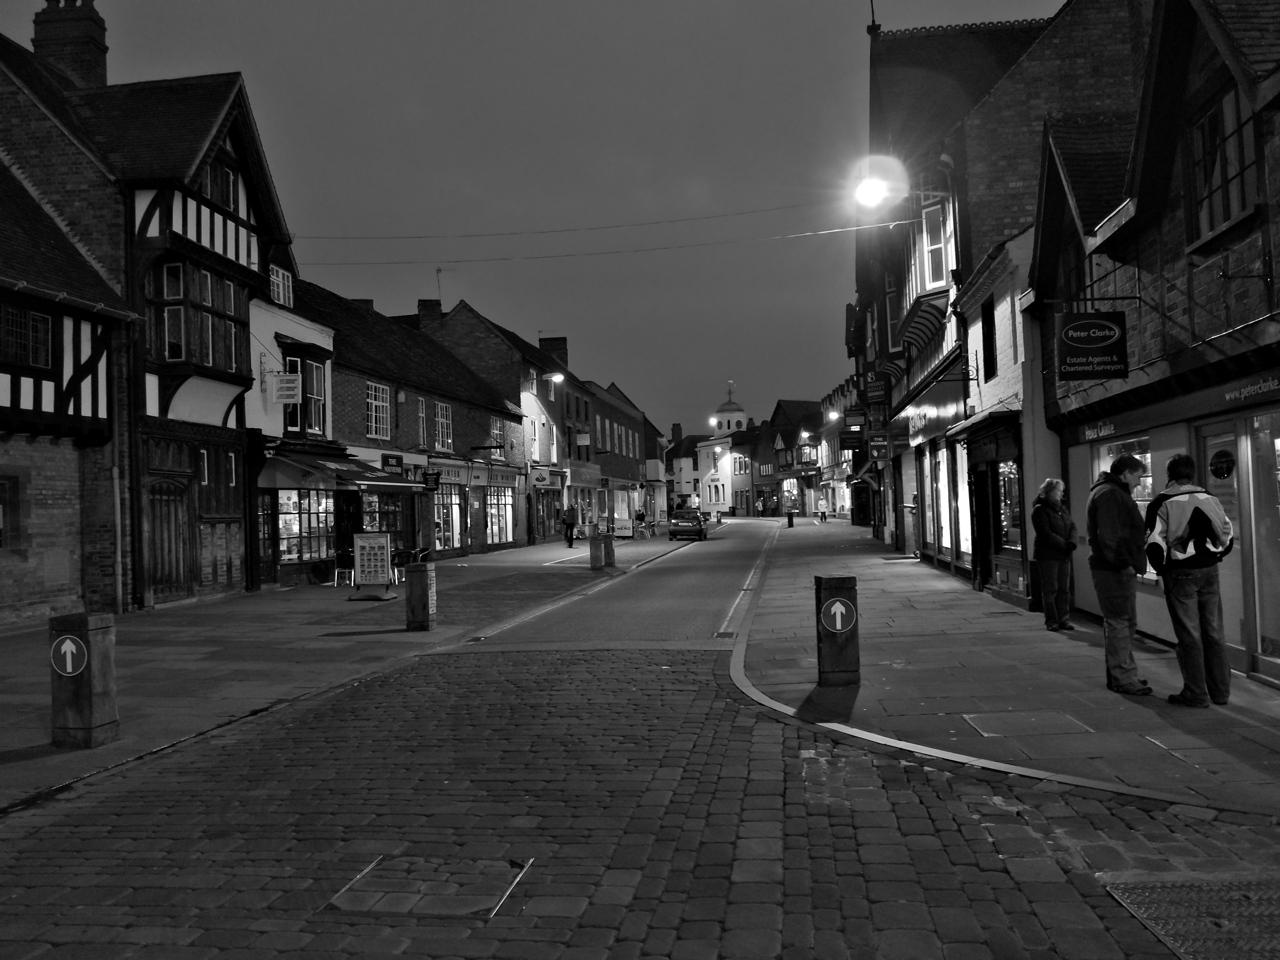 Stratford at night